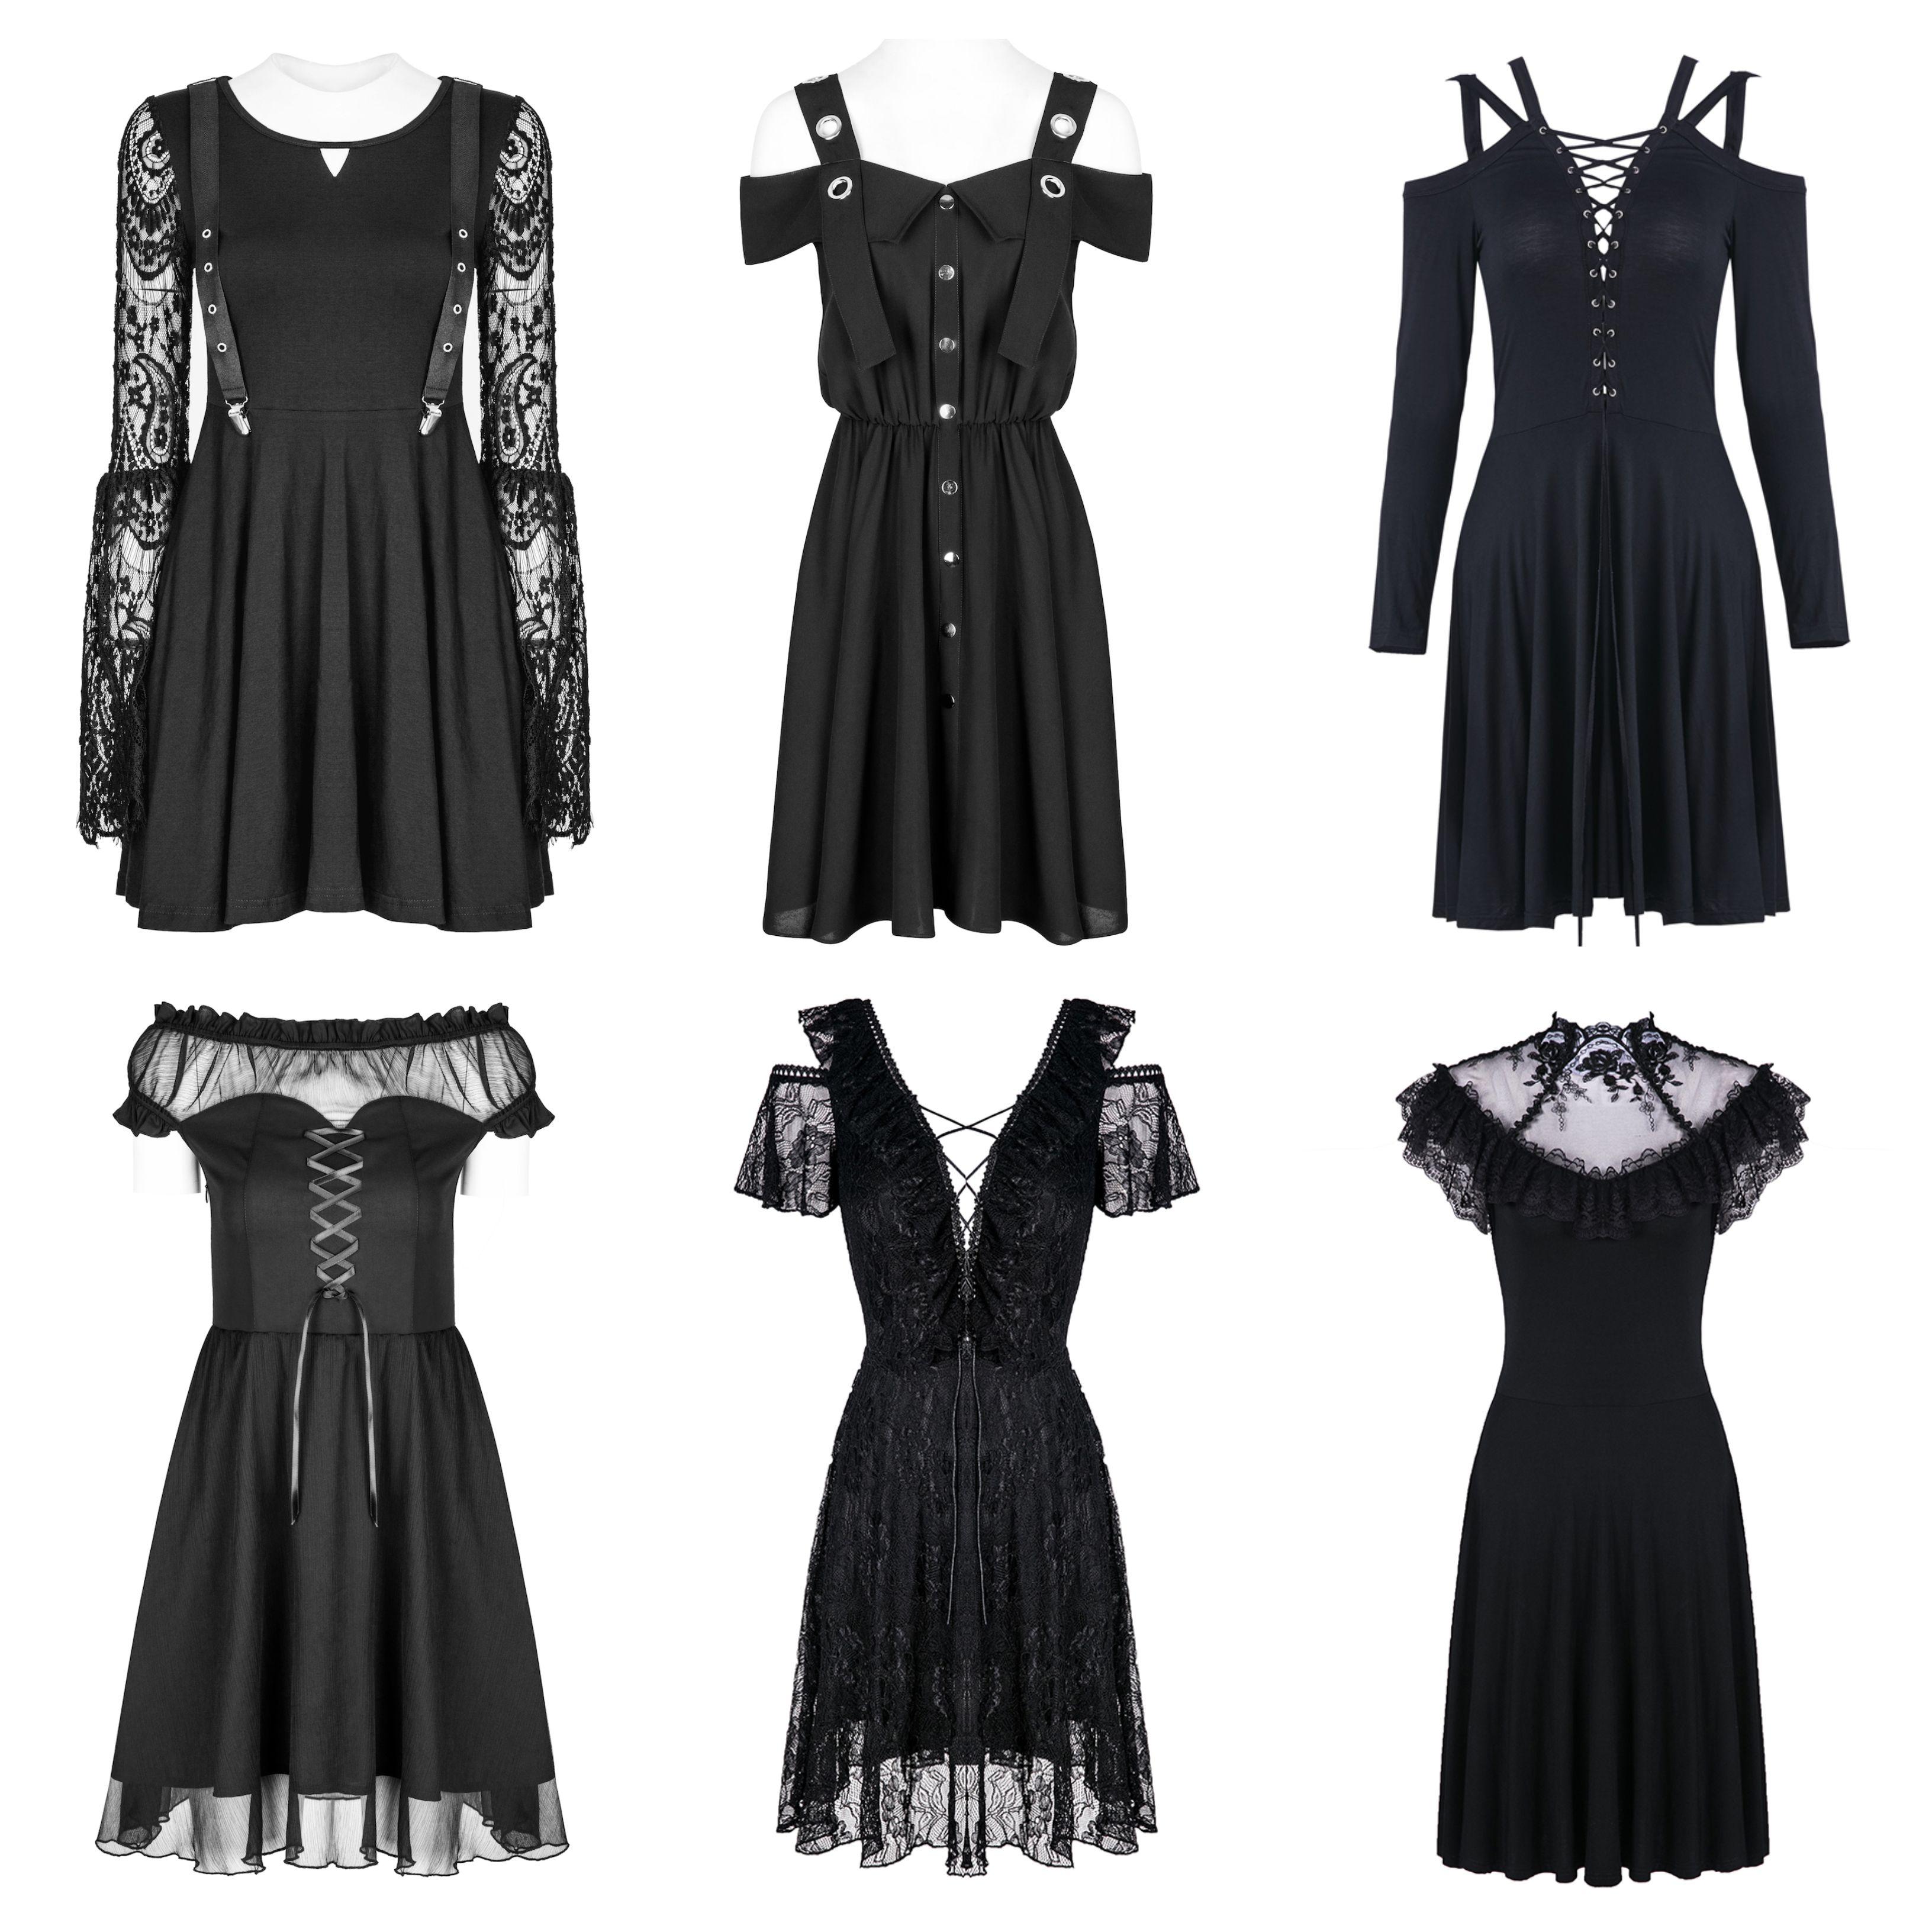 Black Summer Dresses Summer Black Dress Alternative Dress Beautiful Fashion [ 3264 x 3264 Pixel ]